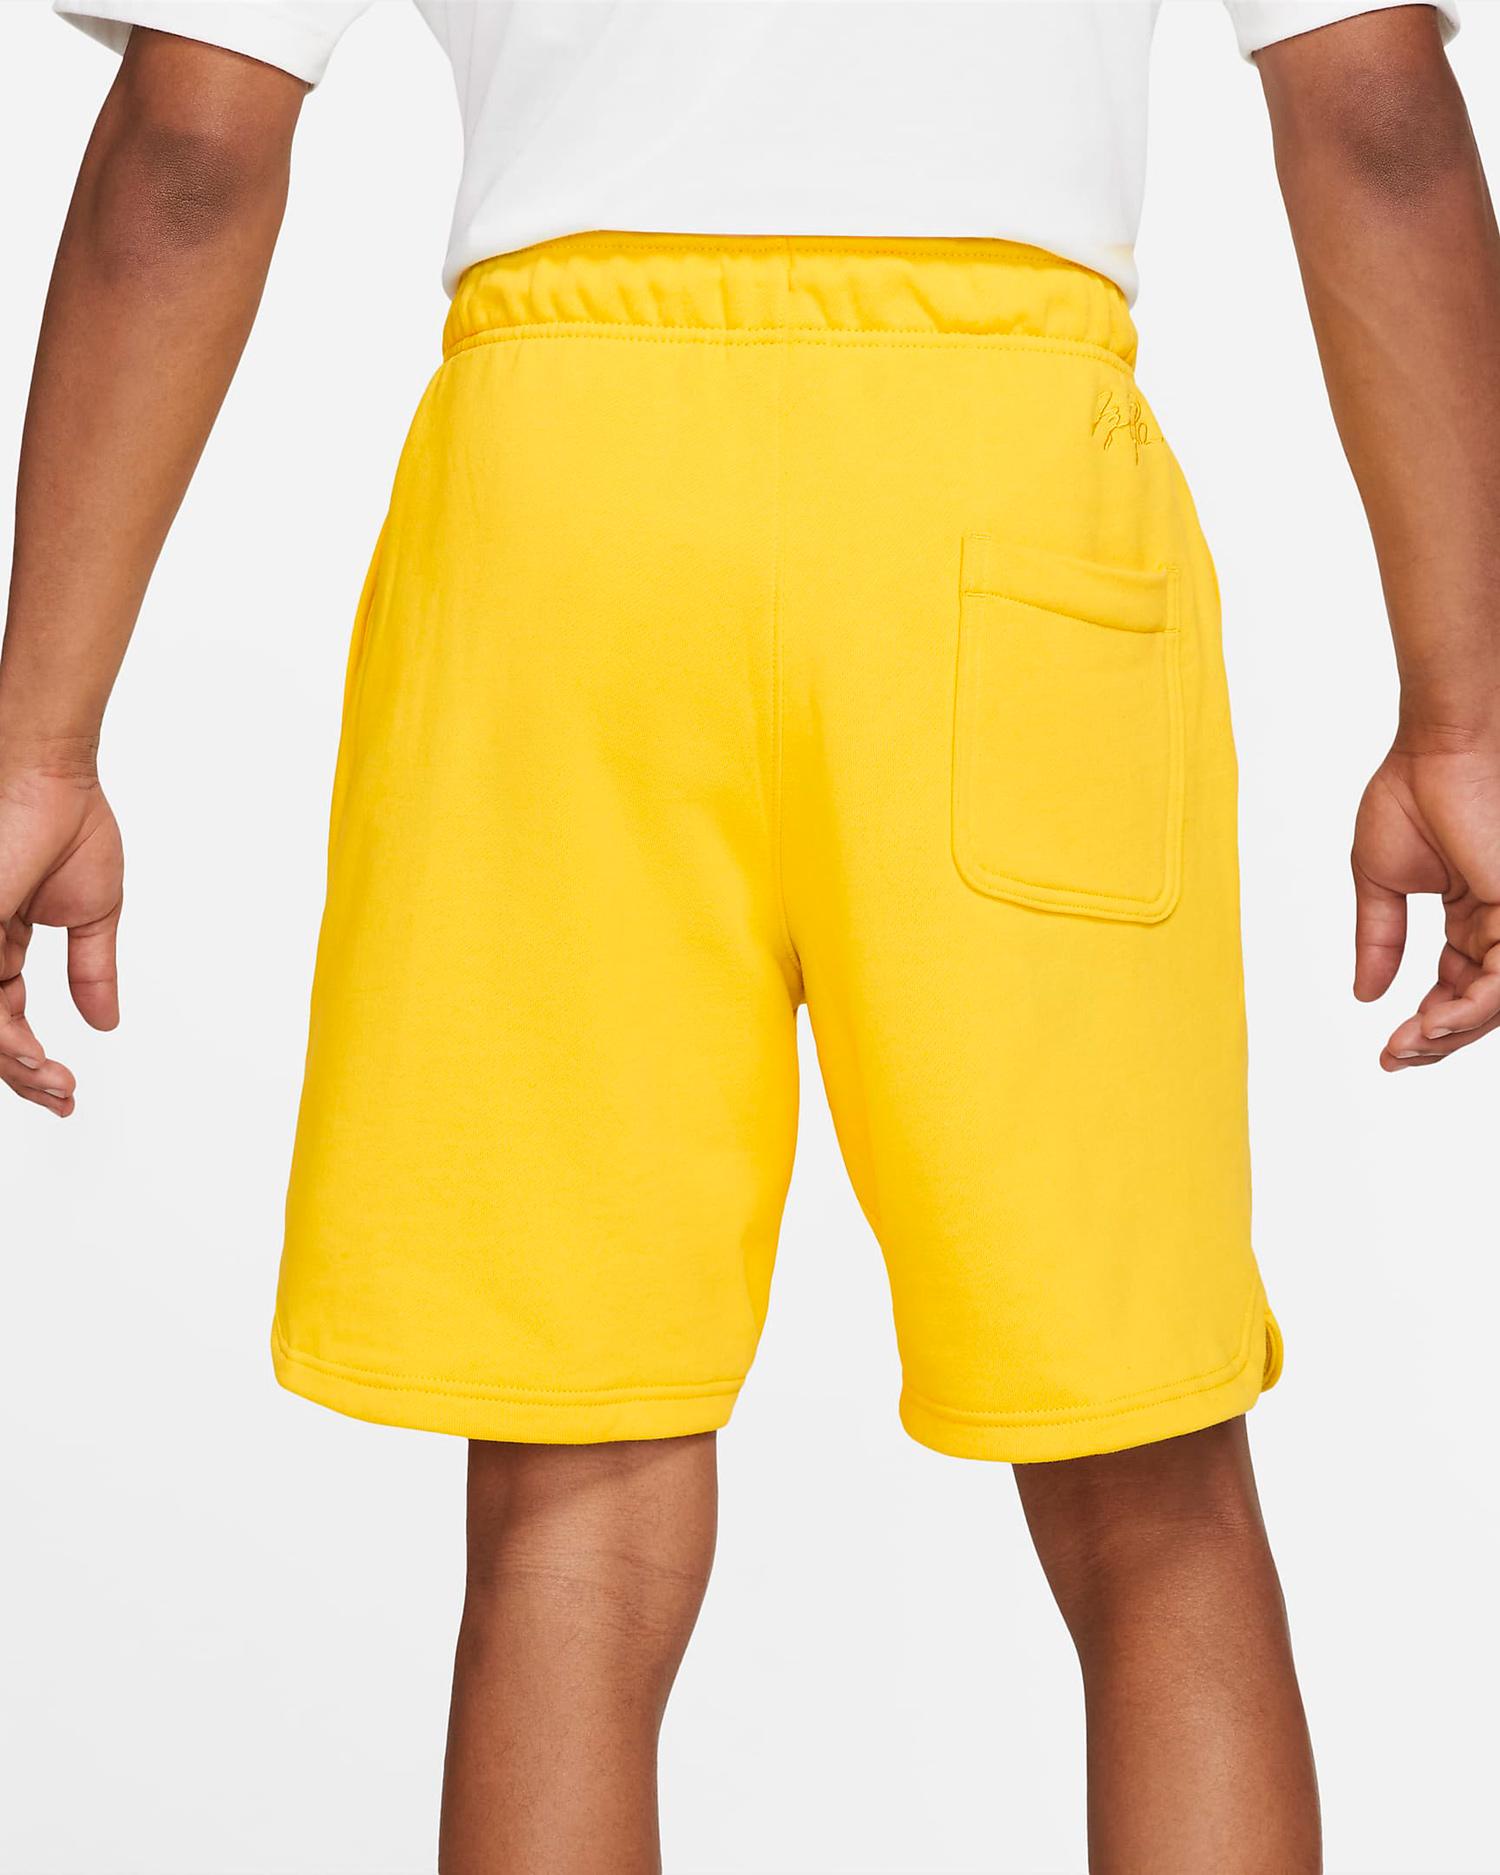 jordan-essential-fleece-shorts-tour-yellow-2